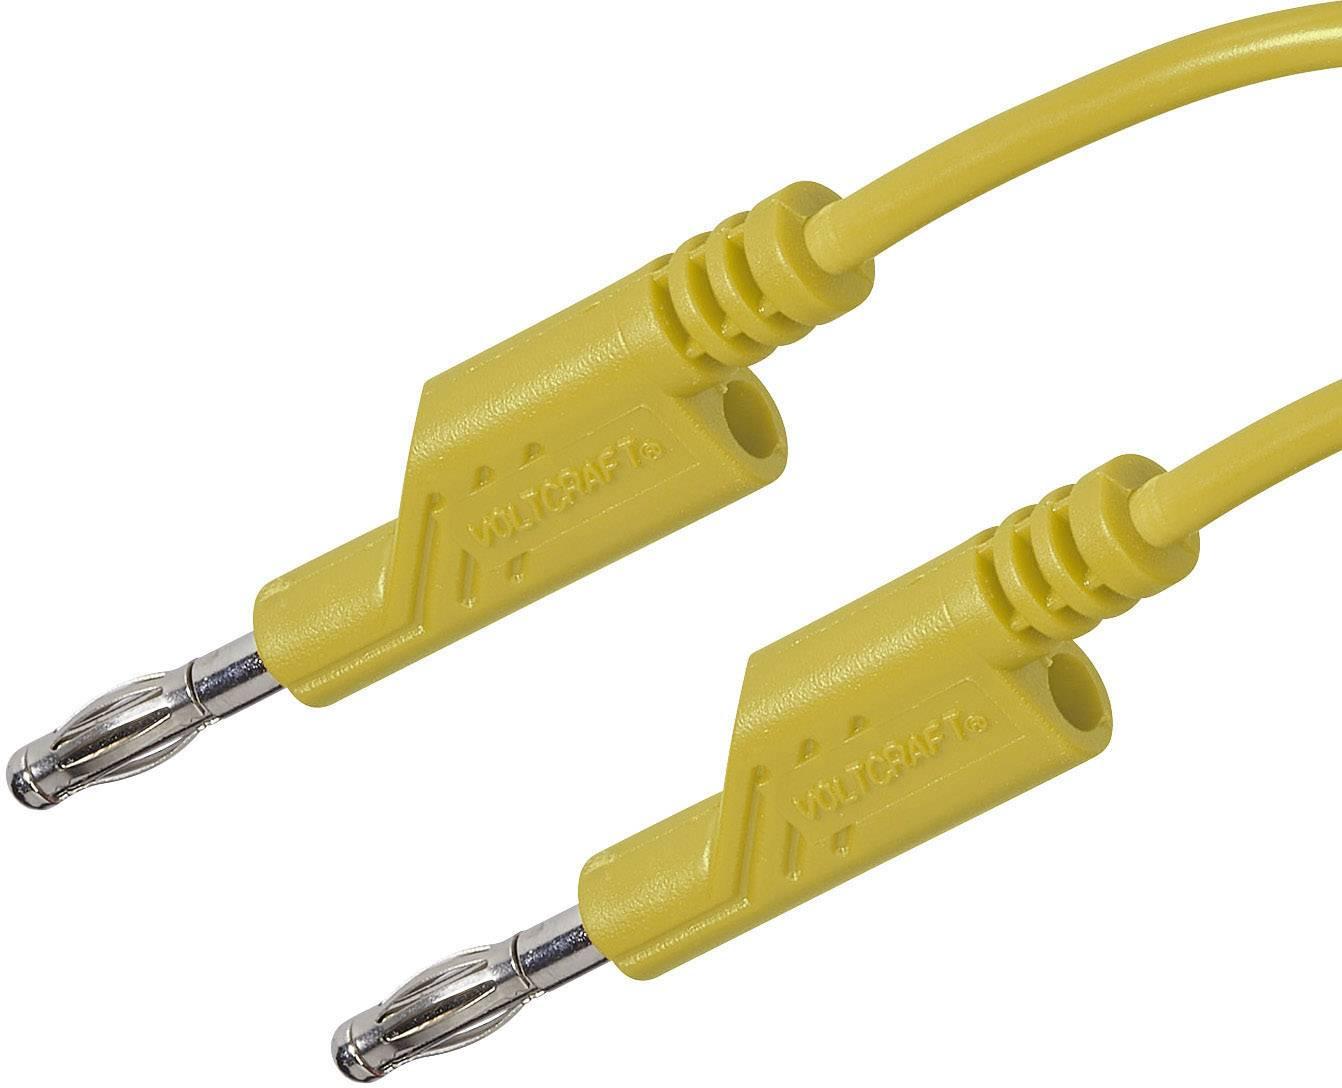 Merací kábel Voltcraft 1 mm², 4 mm, 1 m, žltý